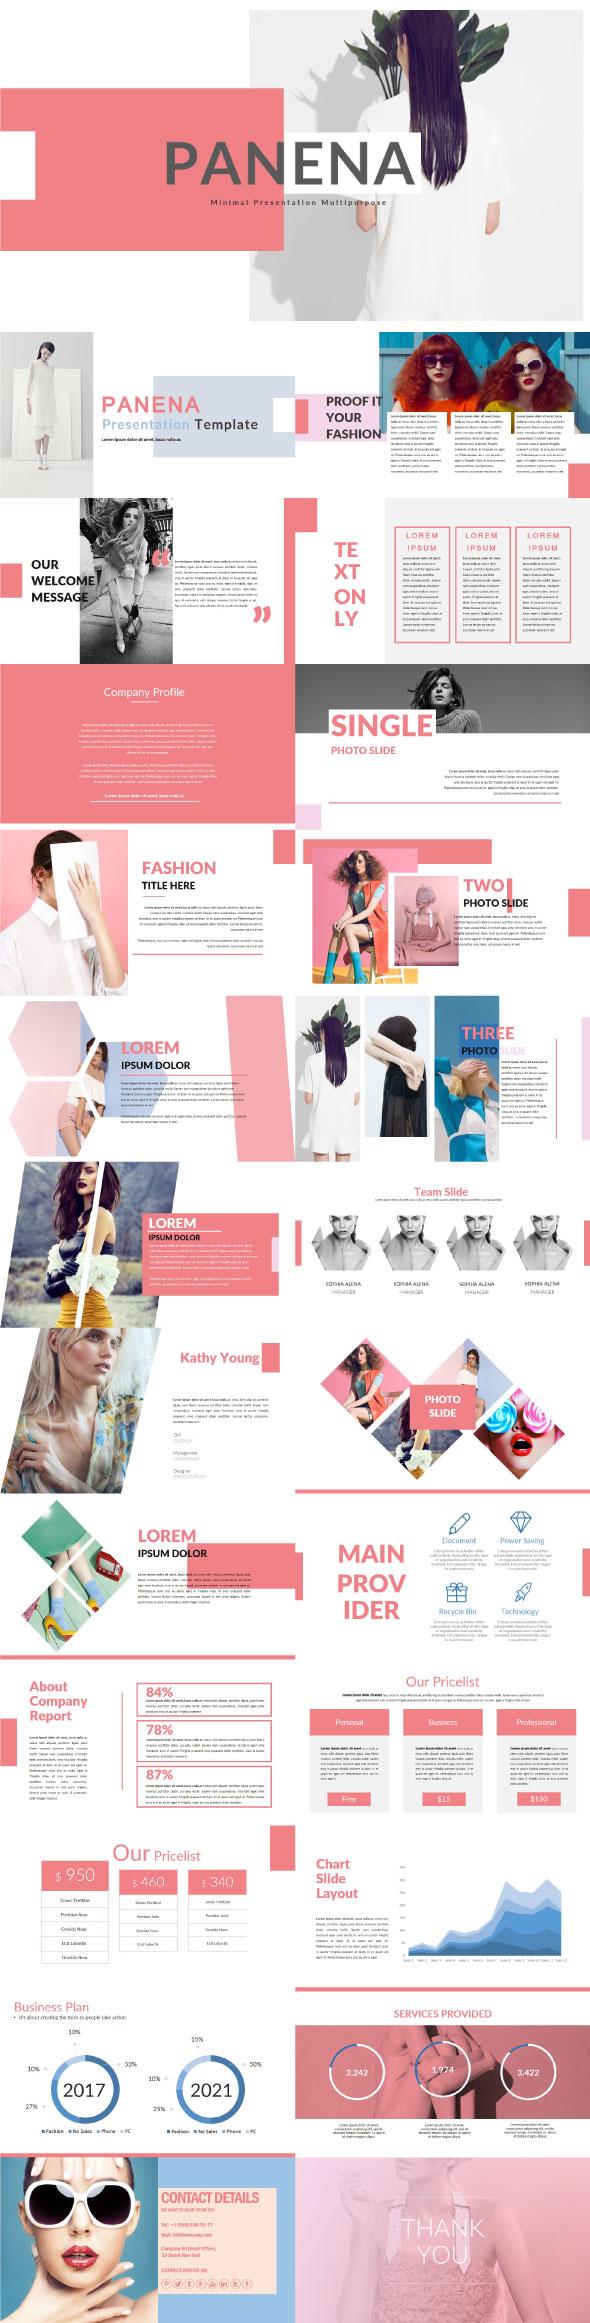 Panena Multipurpose Template - Creative PowerPoint Templates